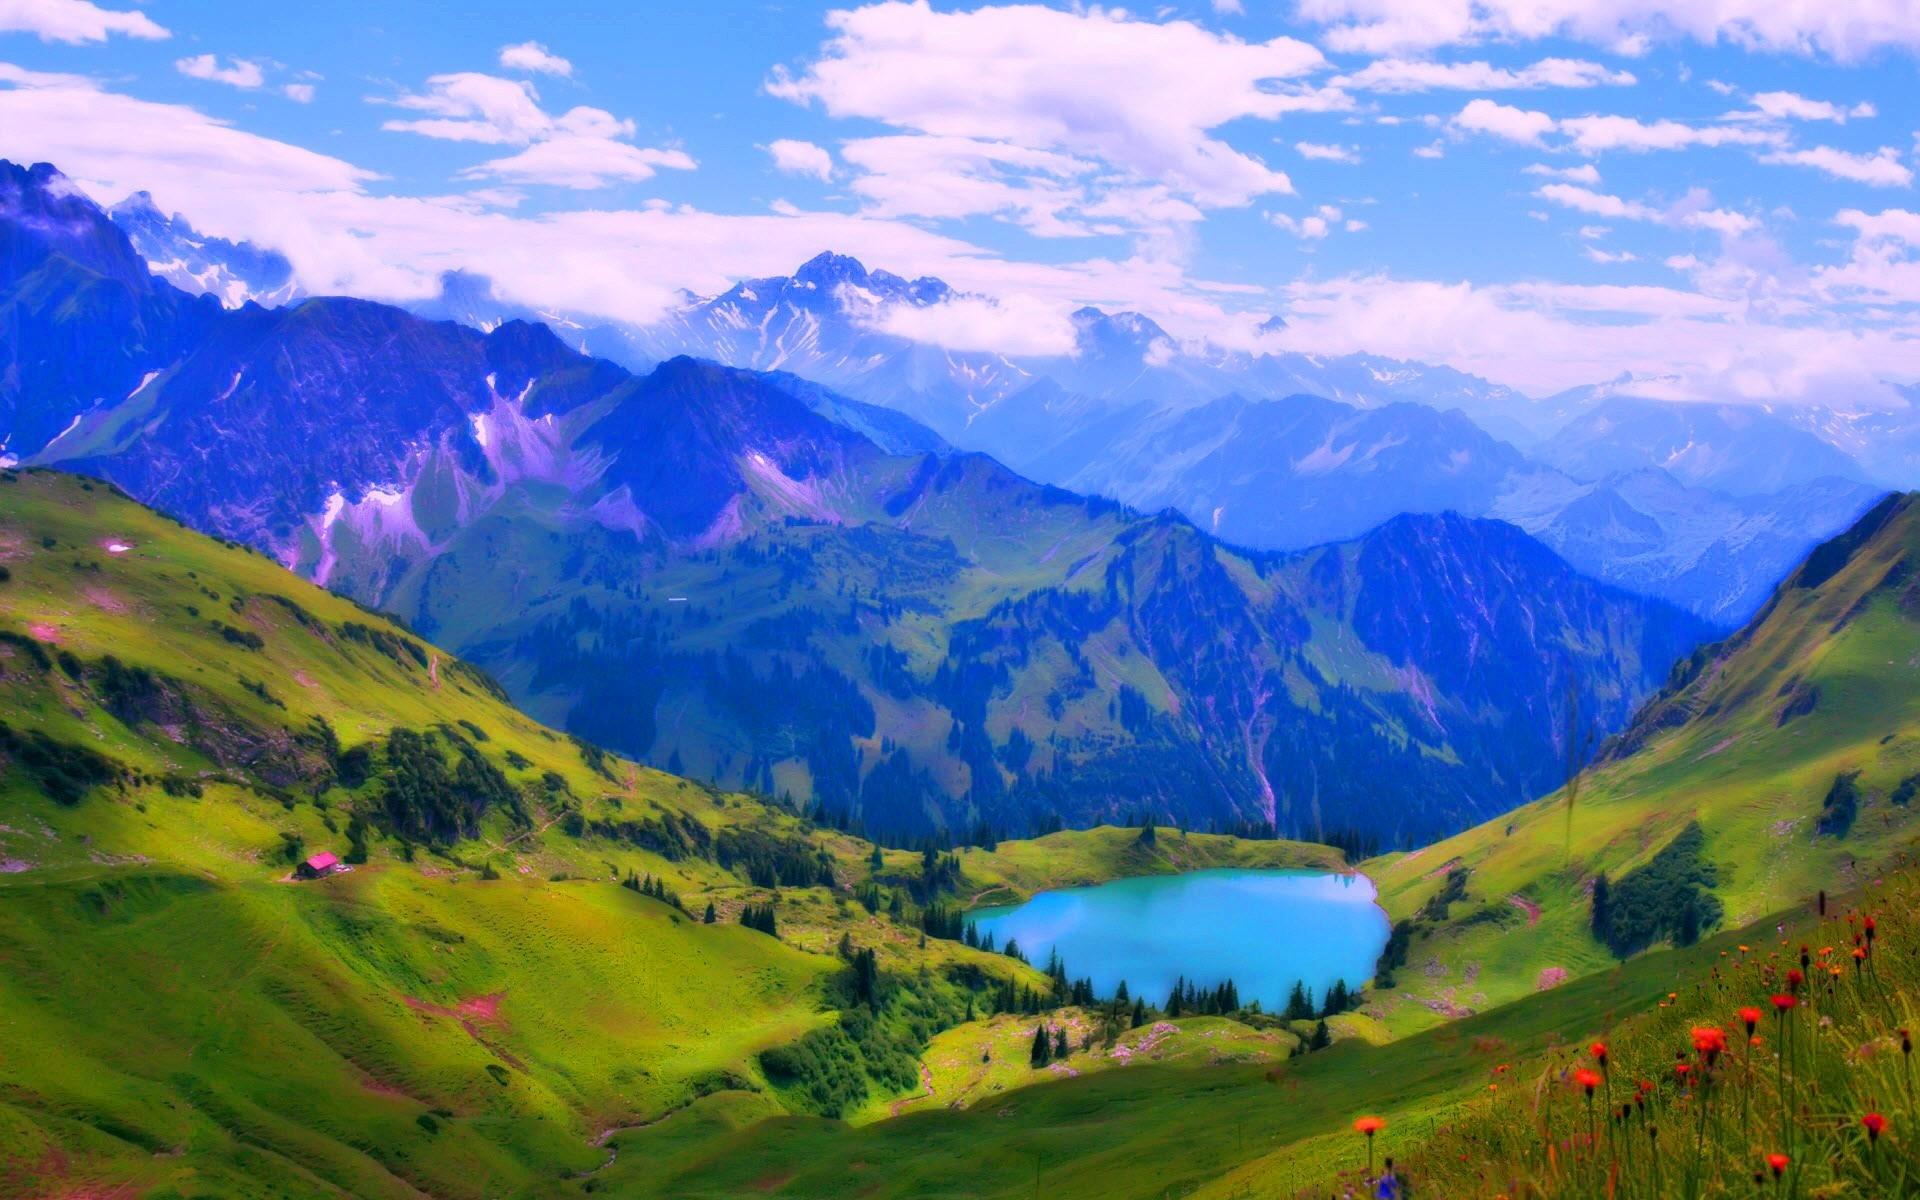 Verde Full Hd Fondo De Pantalla And Fondo De Escritorio: Turquoise Lake In The Mountains Full HD Fondo De Pantalla